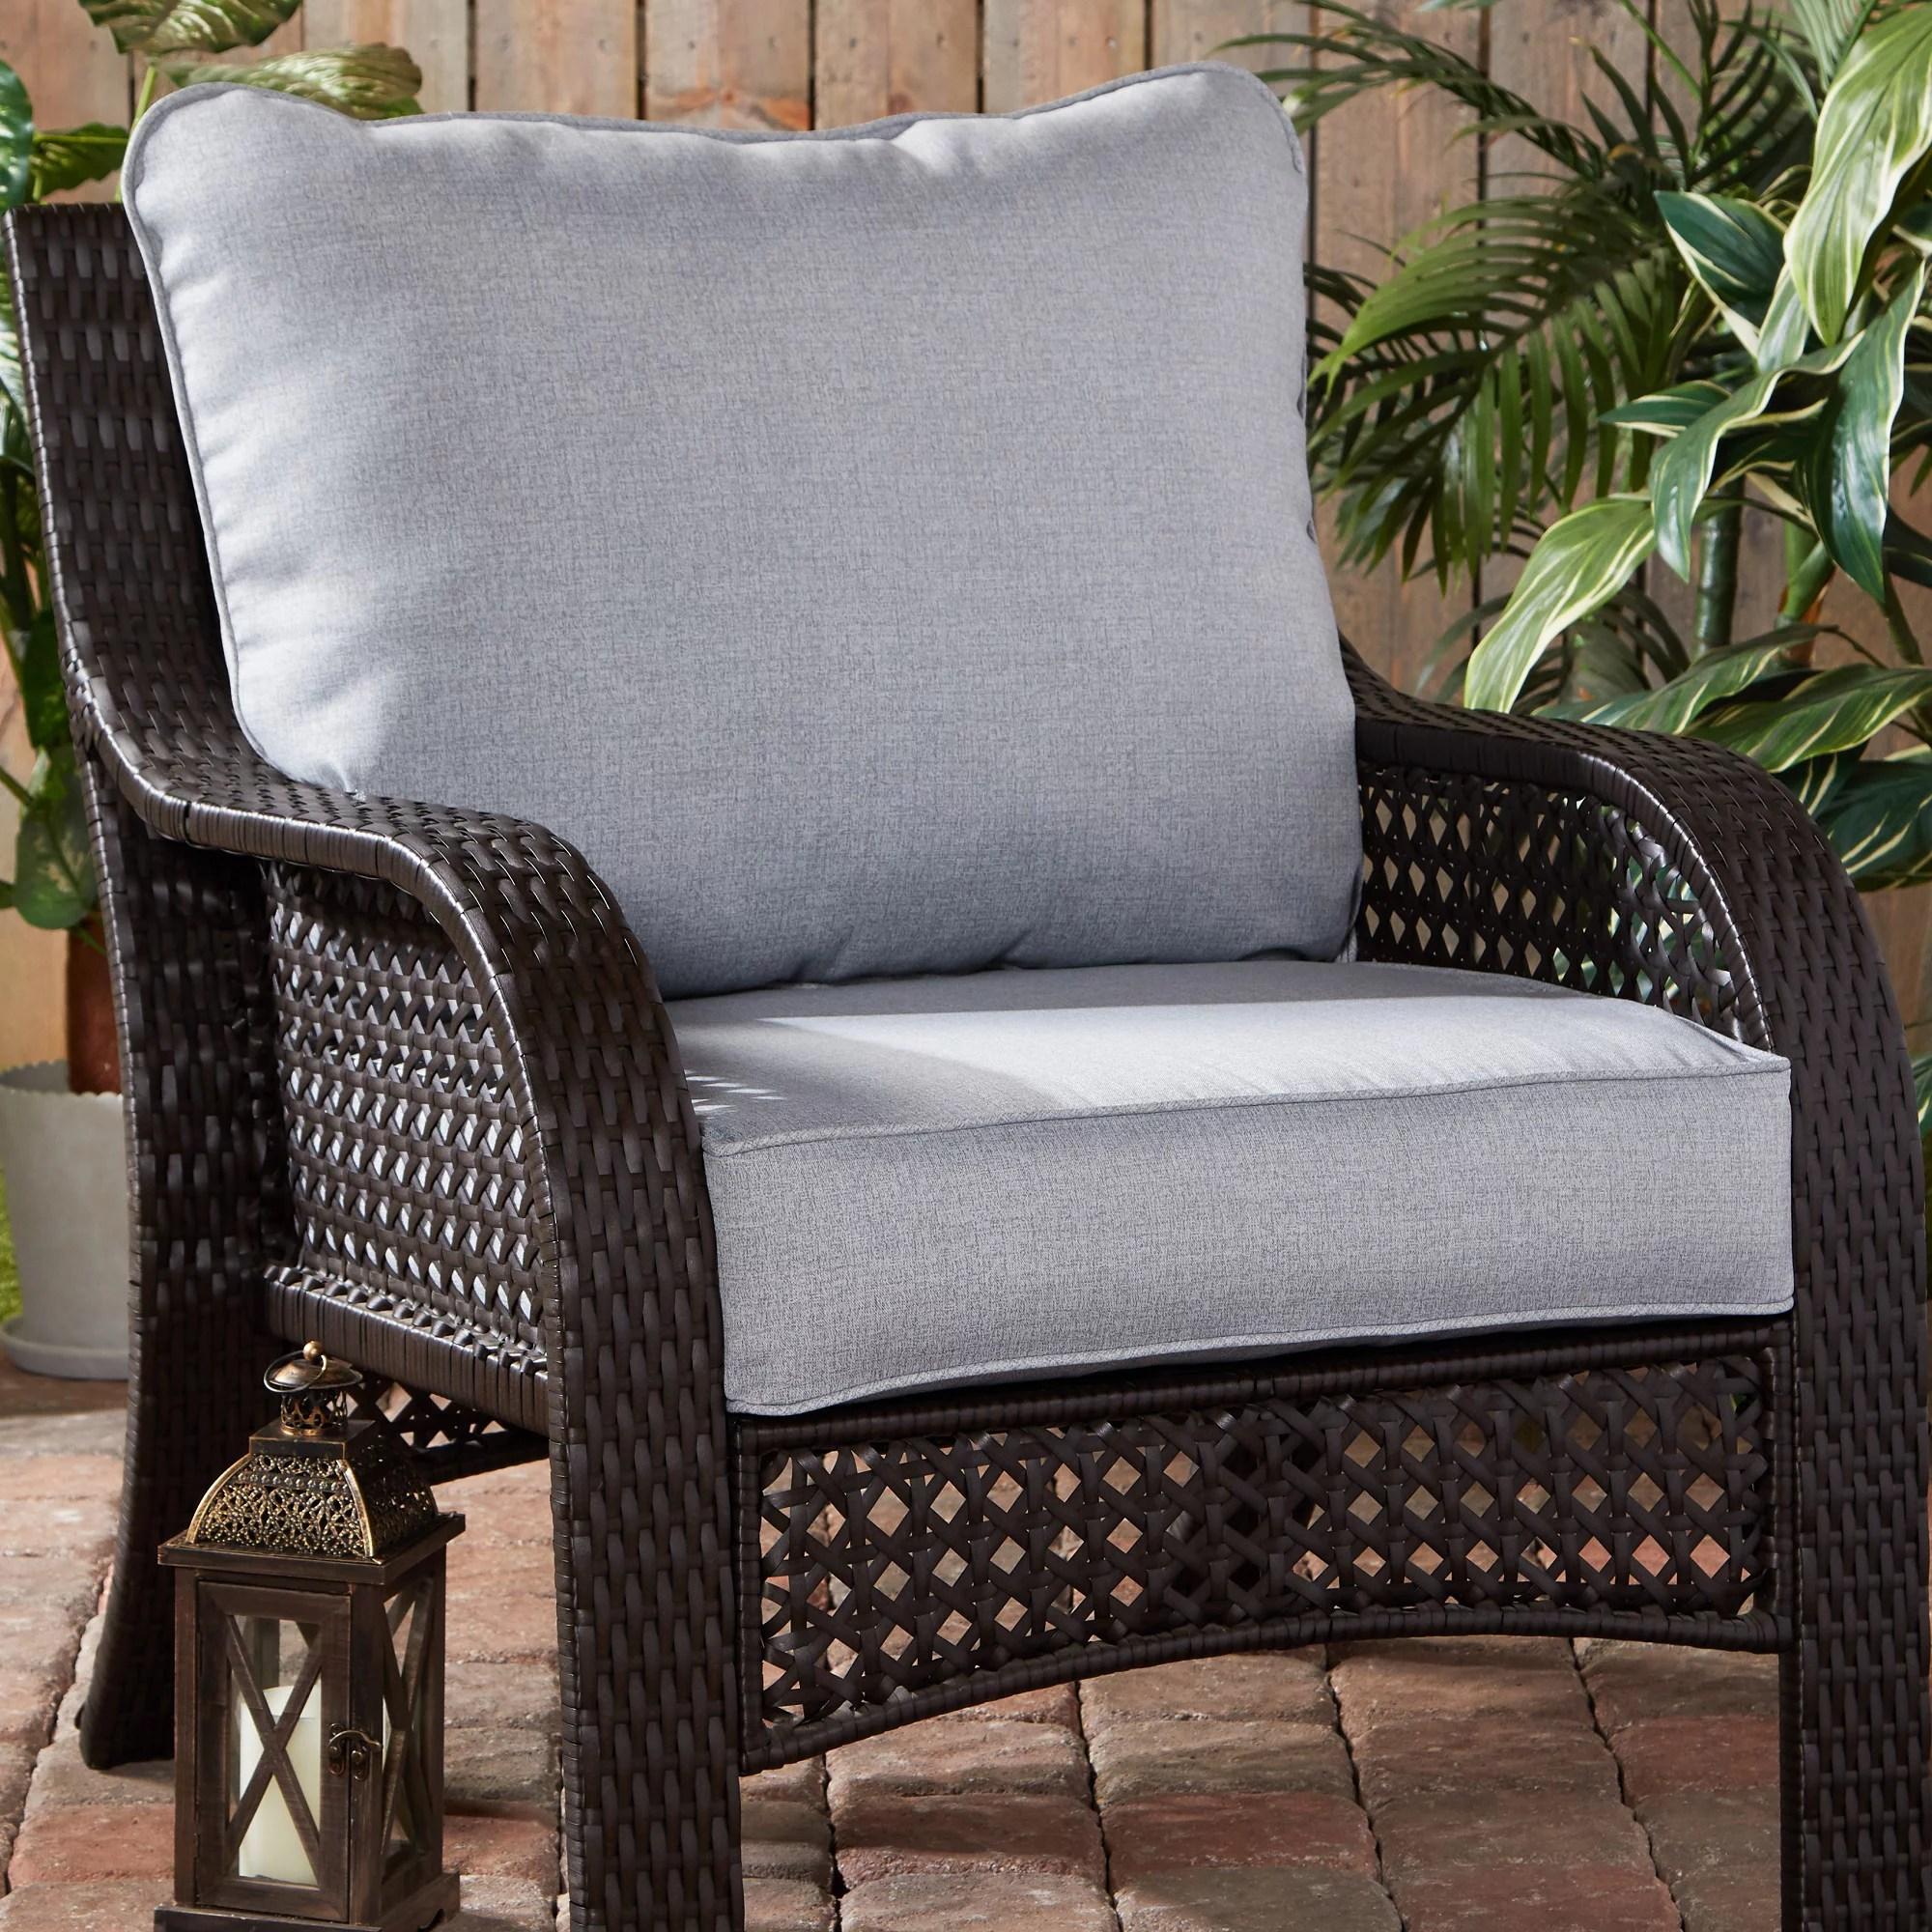 heather gray outdoor 2 pc deep seat cushion set walmart com